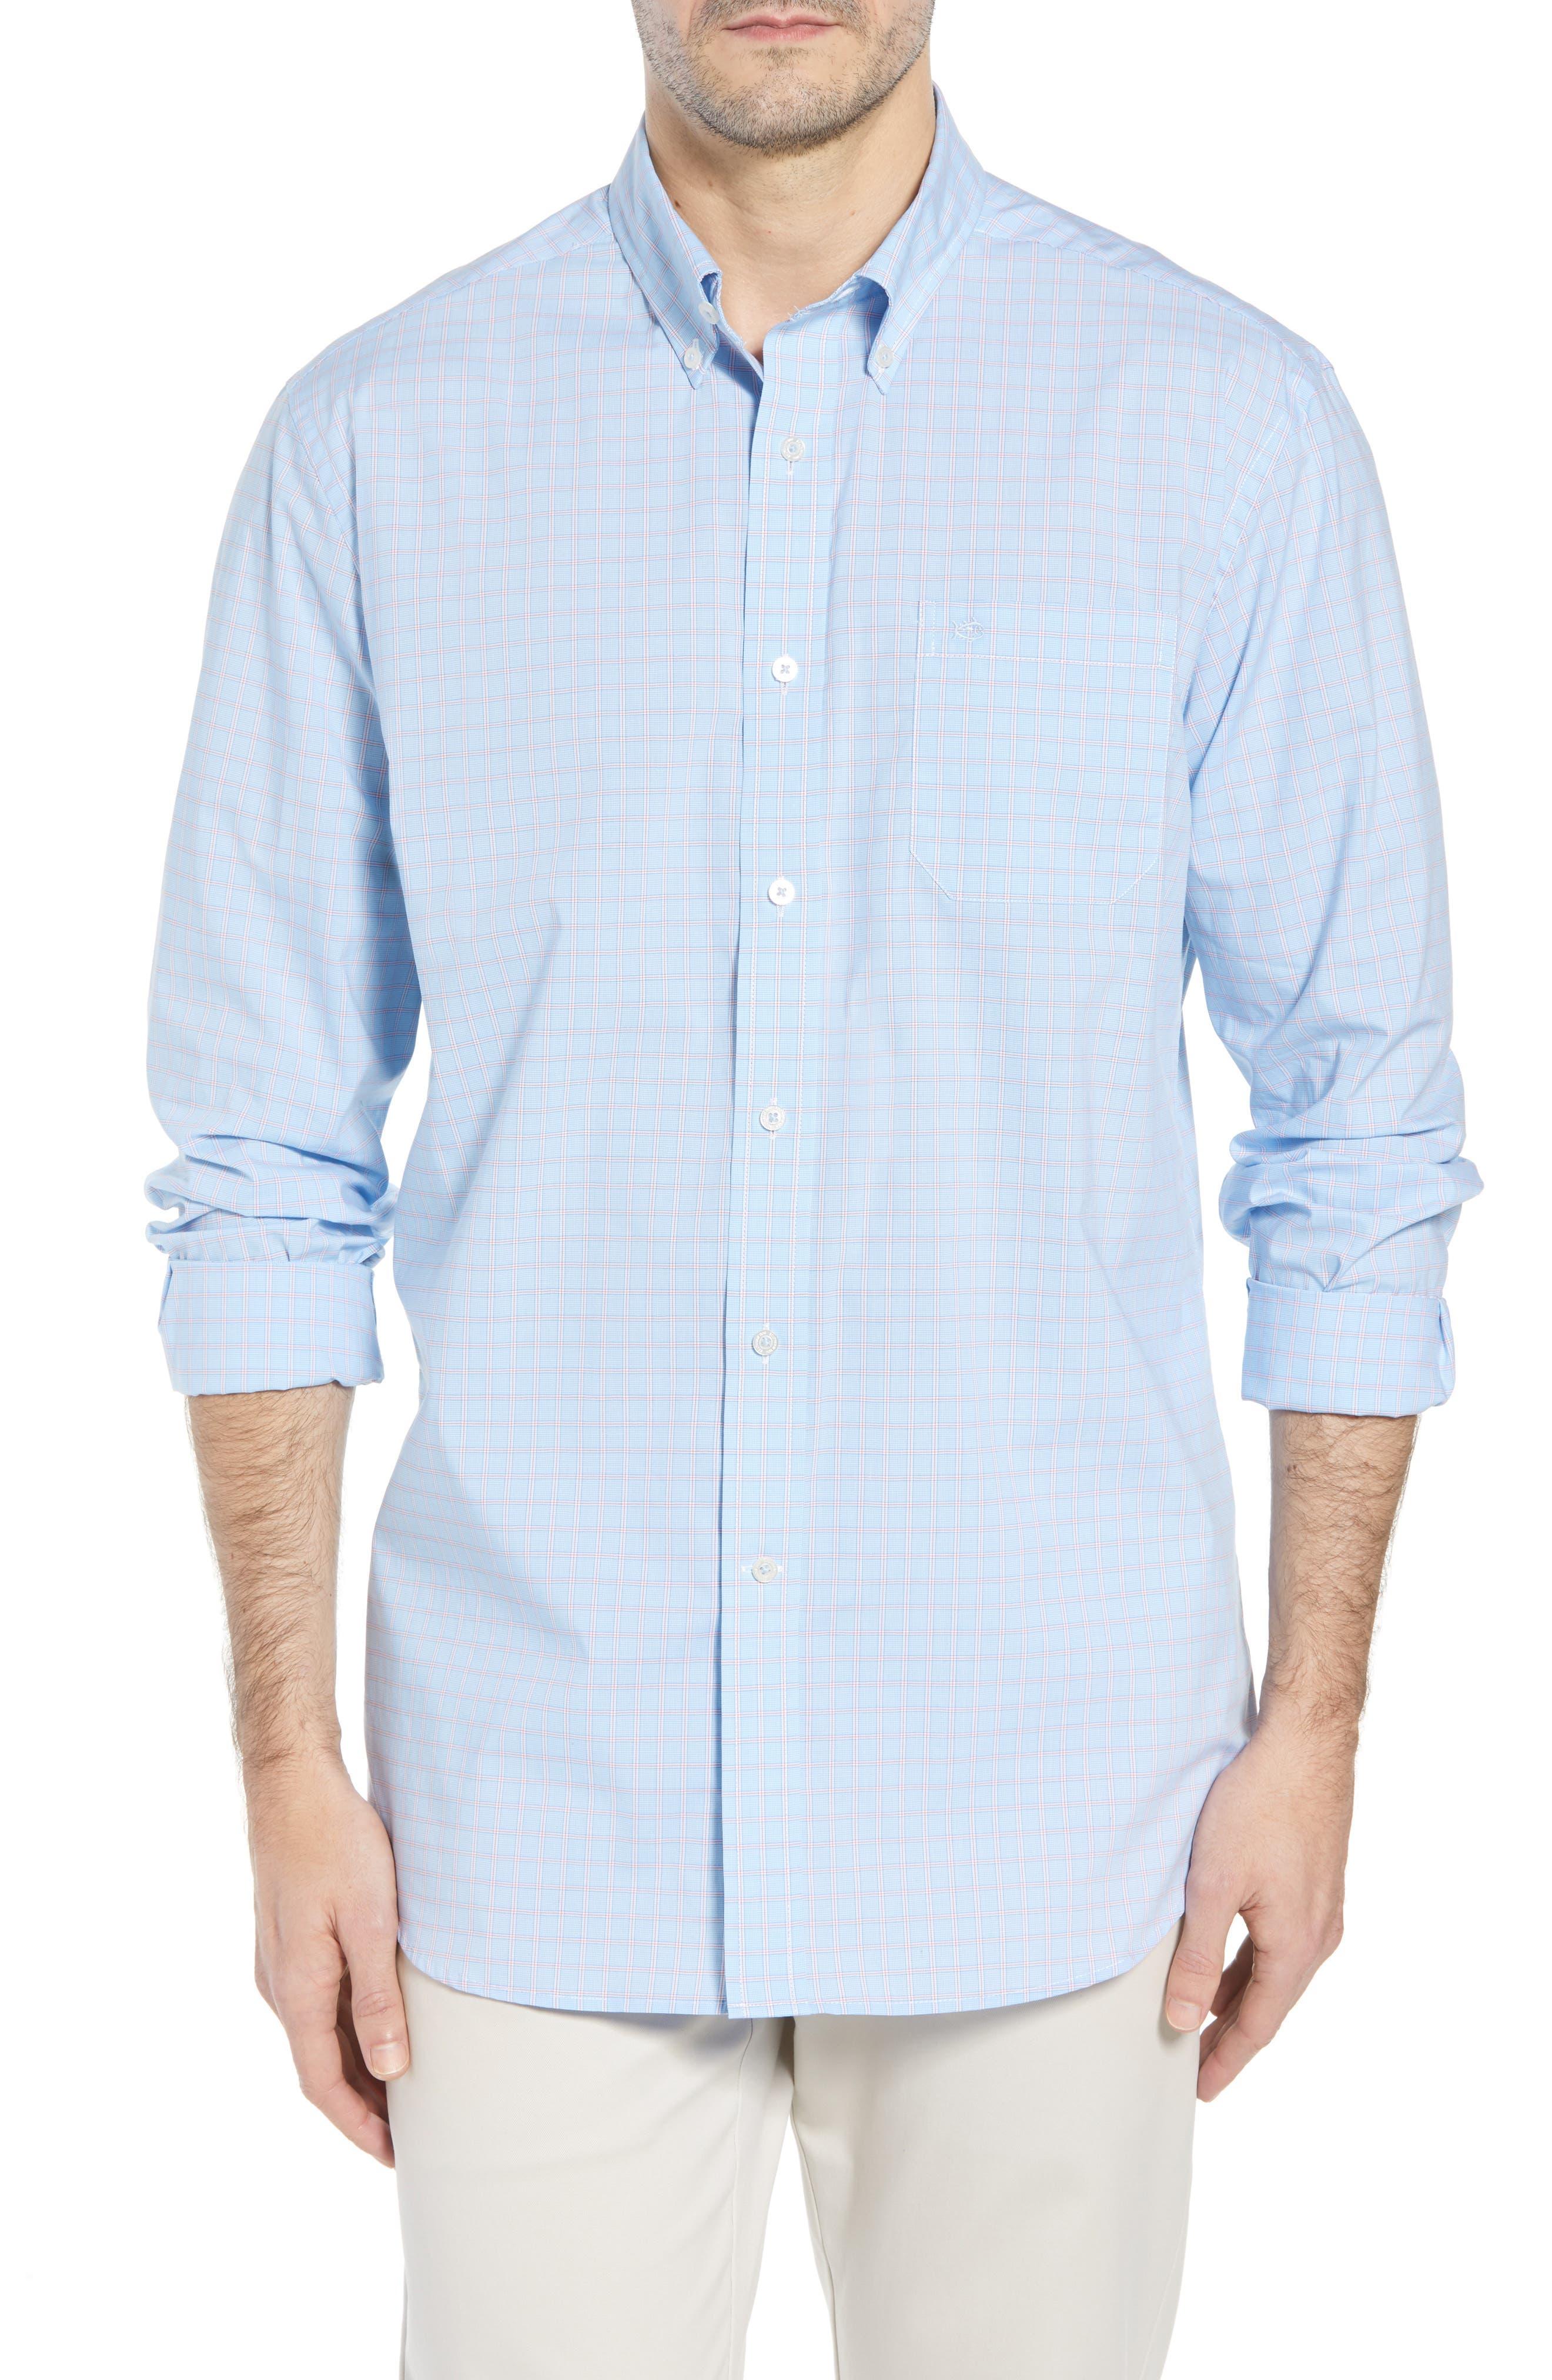 Buck Island Regular Fit Stretch Check Sport Shirt,                             Main thumbnail 1, color,                             Blue Stream